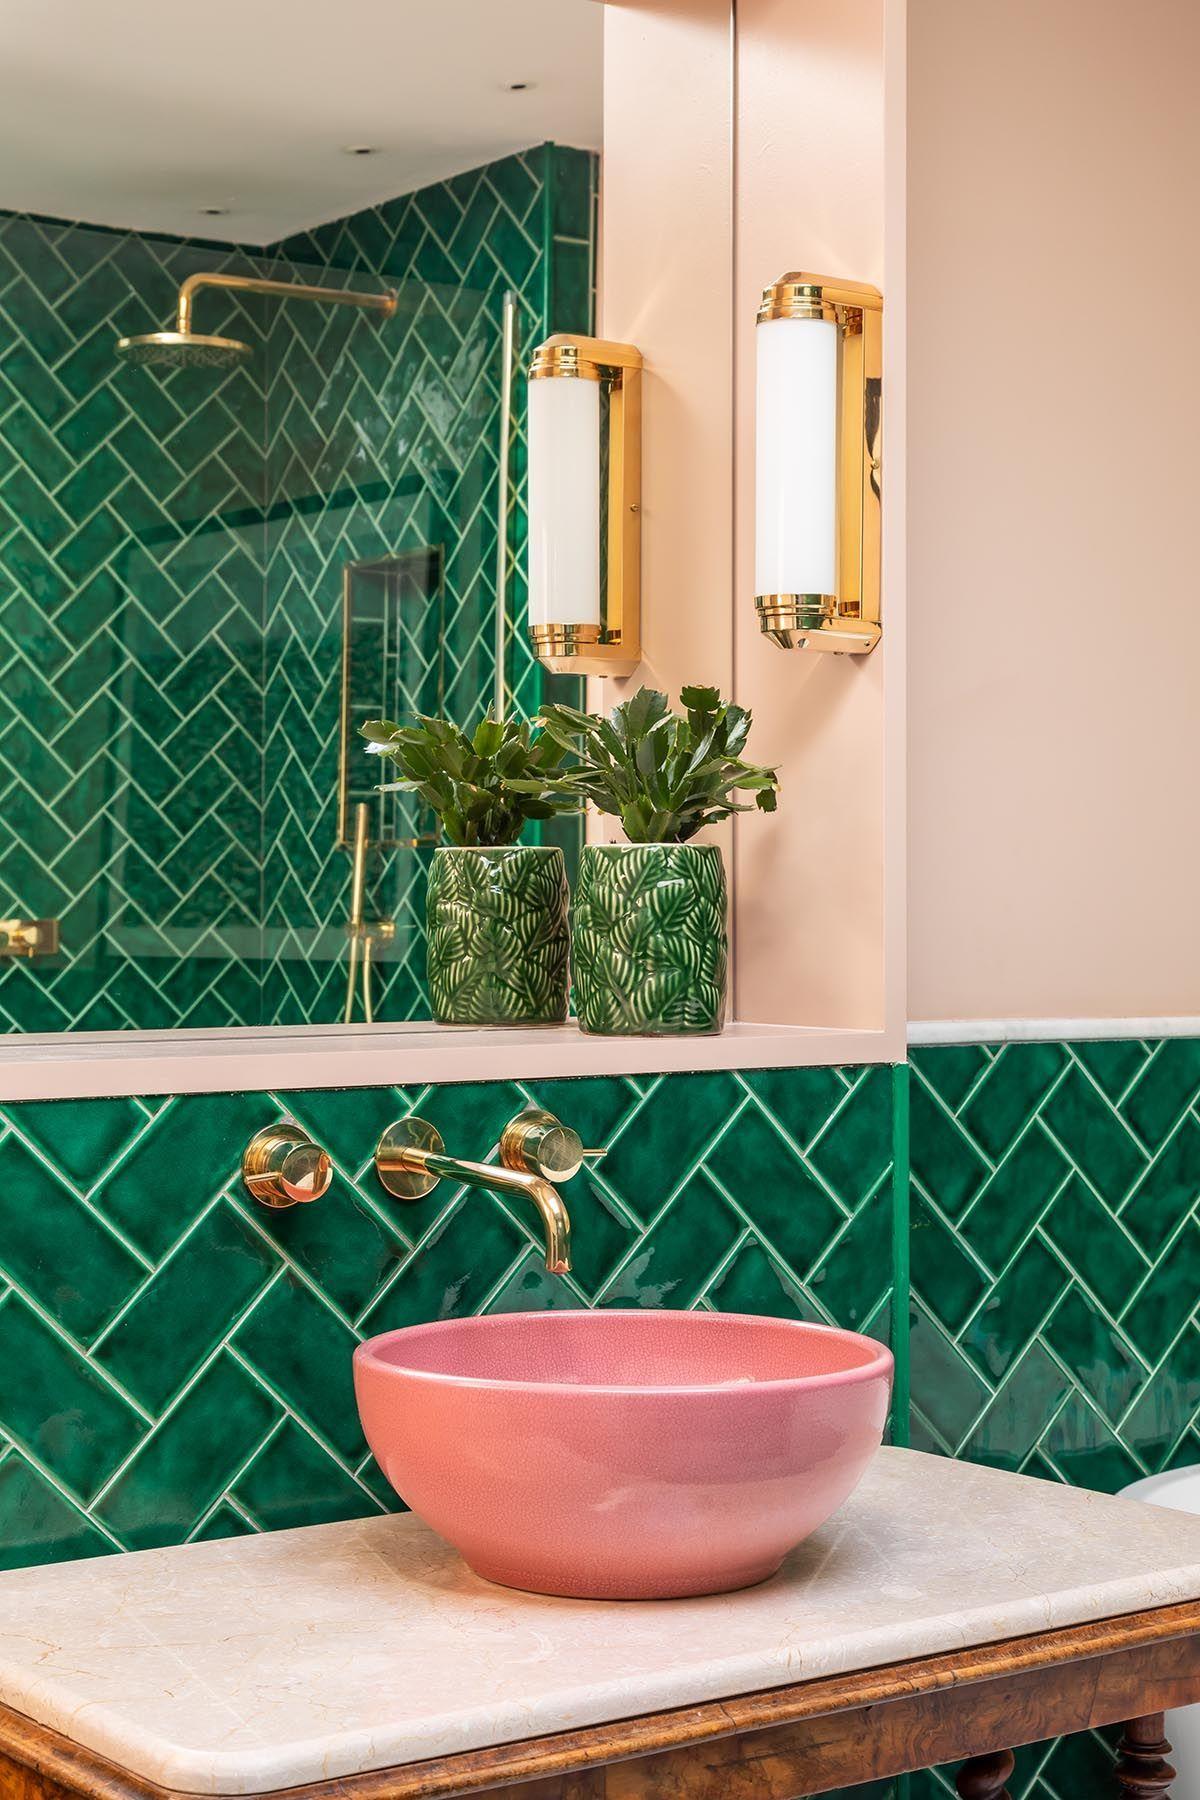 12 Brilliant Bathroom Light Fixture Ideas Inda Homes Bright Apartment Bathroom Inspiration Decor Ceramic Sinks